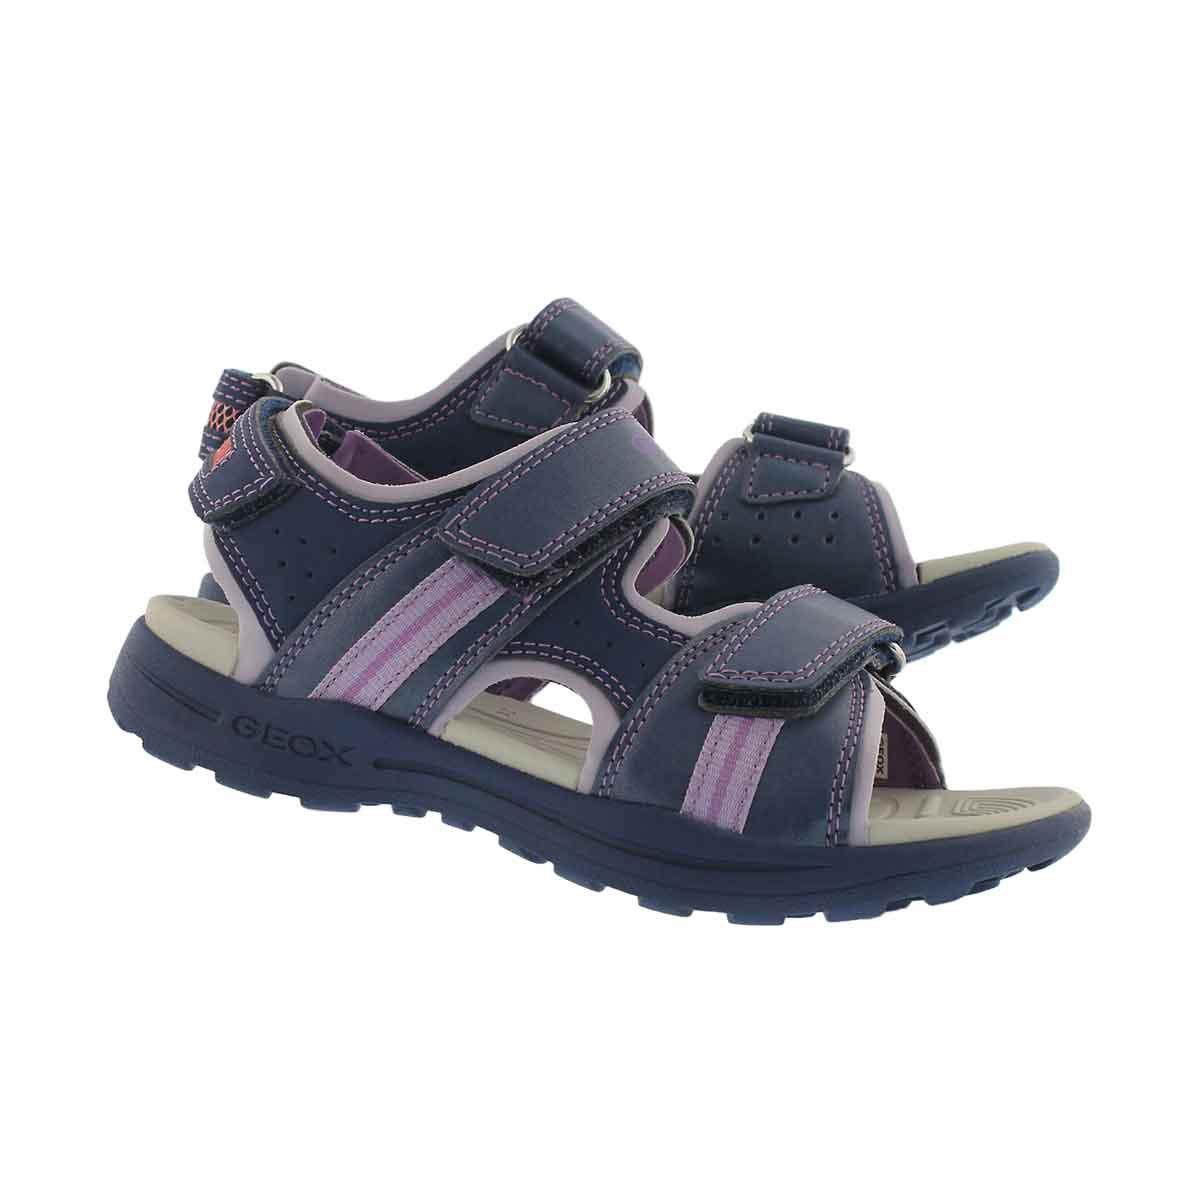 Grls Vaniett nvy/lilac casual sandal